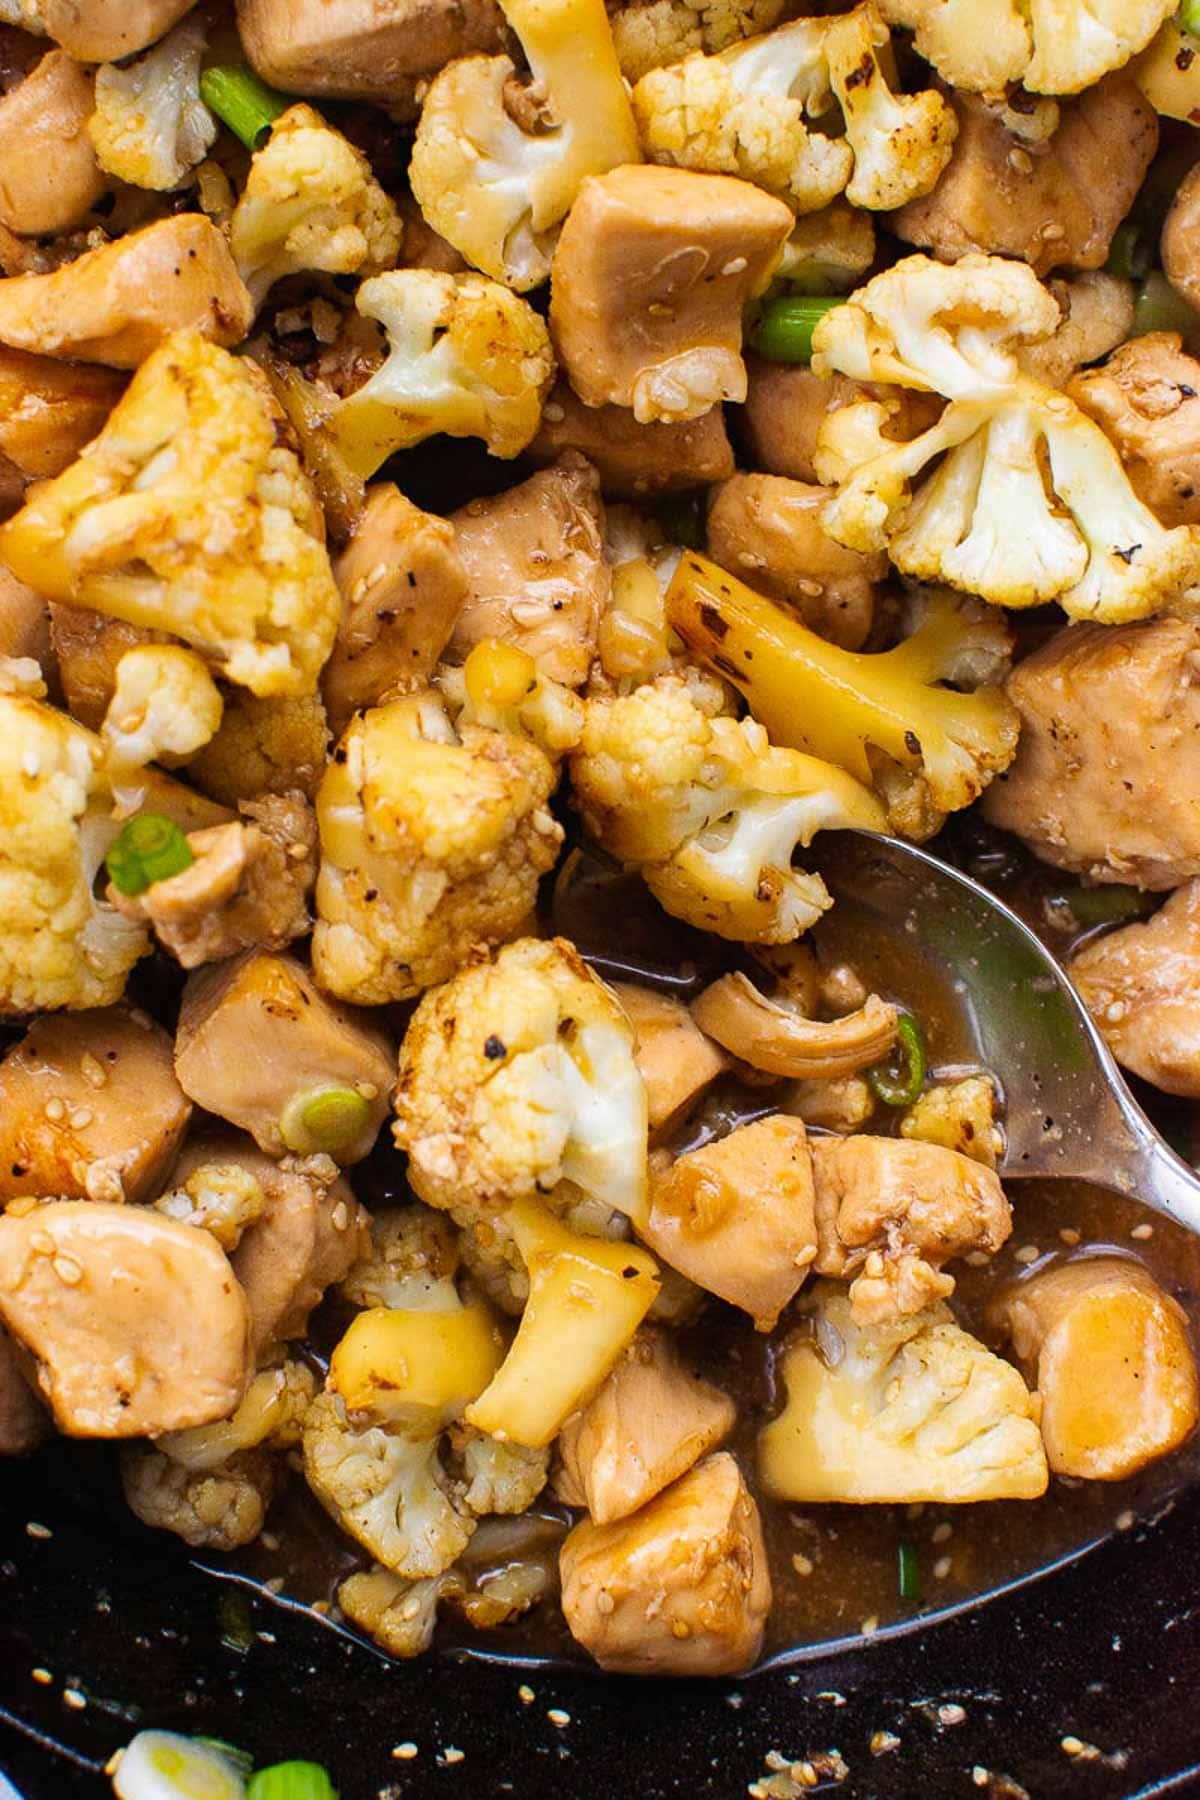 Teriyaki Chicken and Cauliflower garnished with sesame seeds